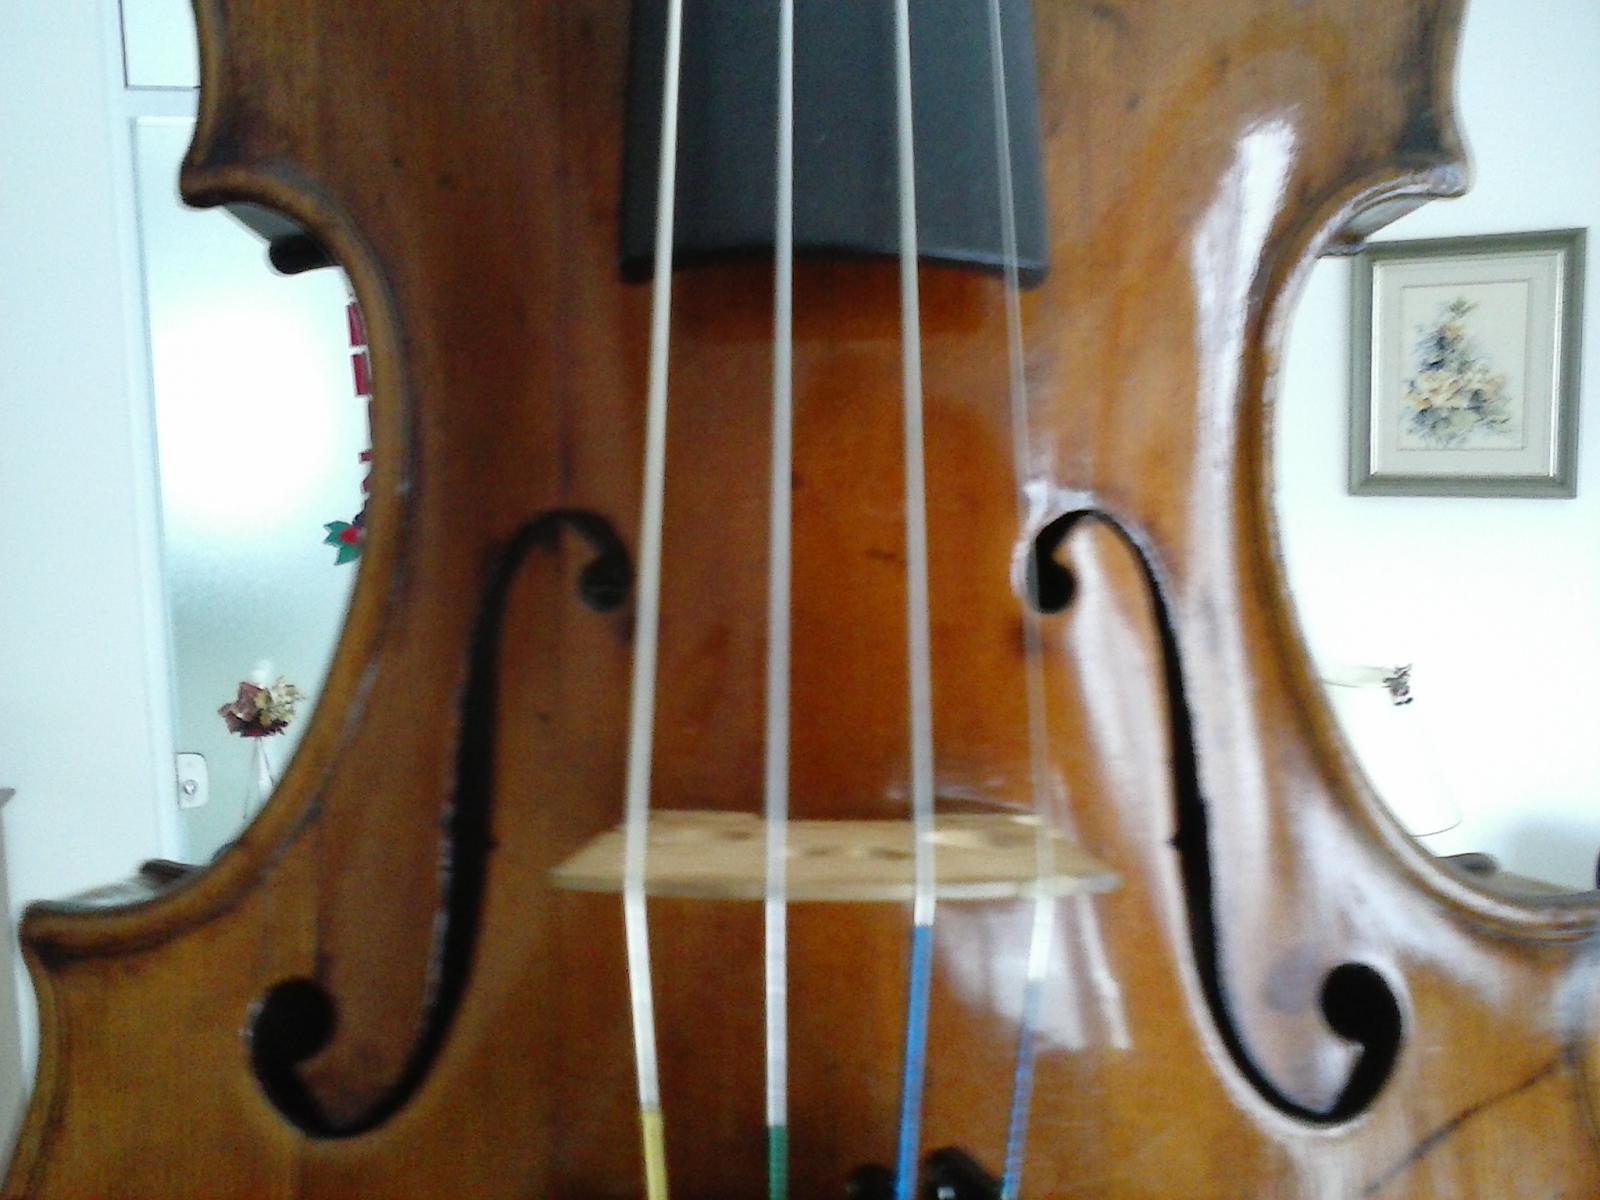 Januarius Gagliano Violin | Naples around 1750 | Michael | Flickr